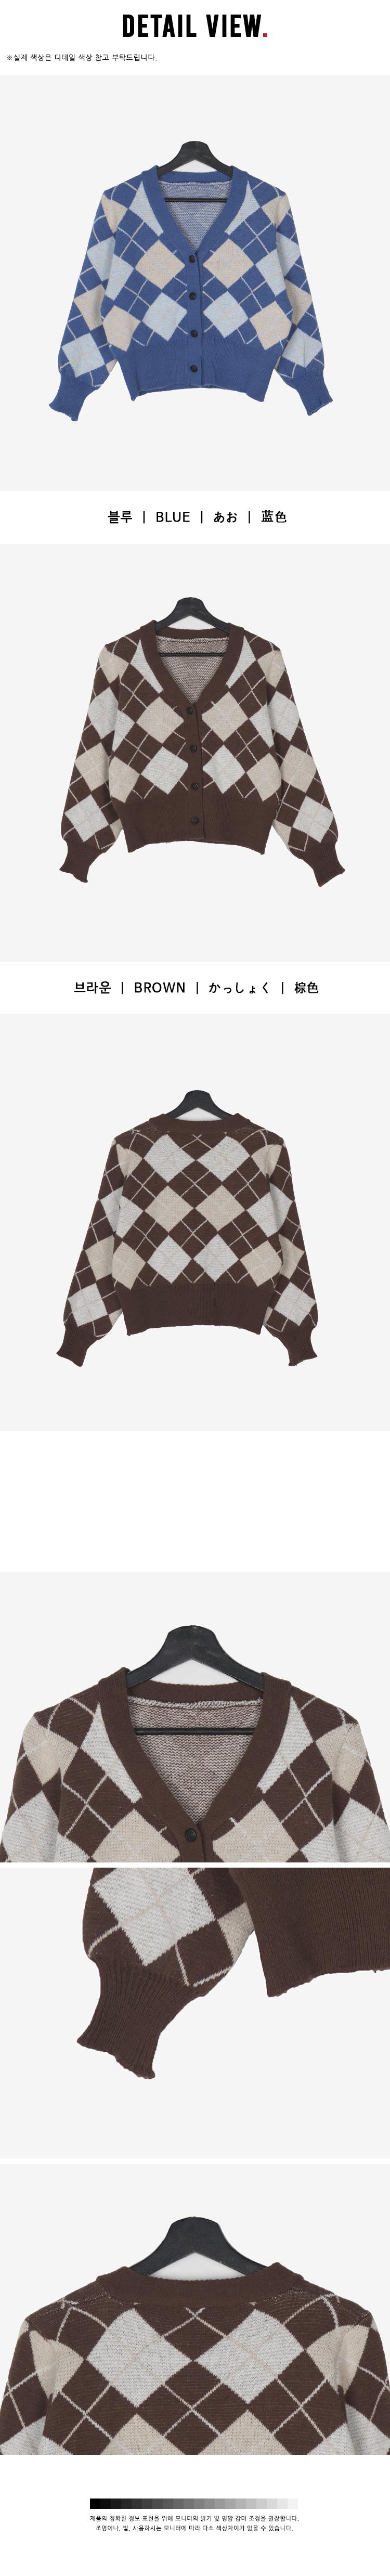 Hazen Argyle V-Neck Knitwear Cardigan